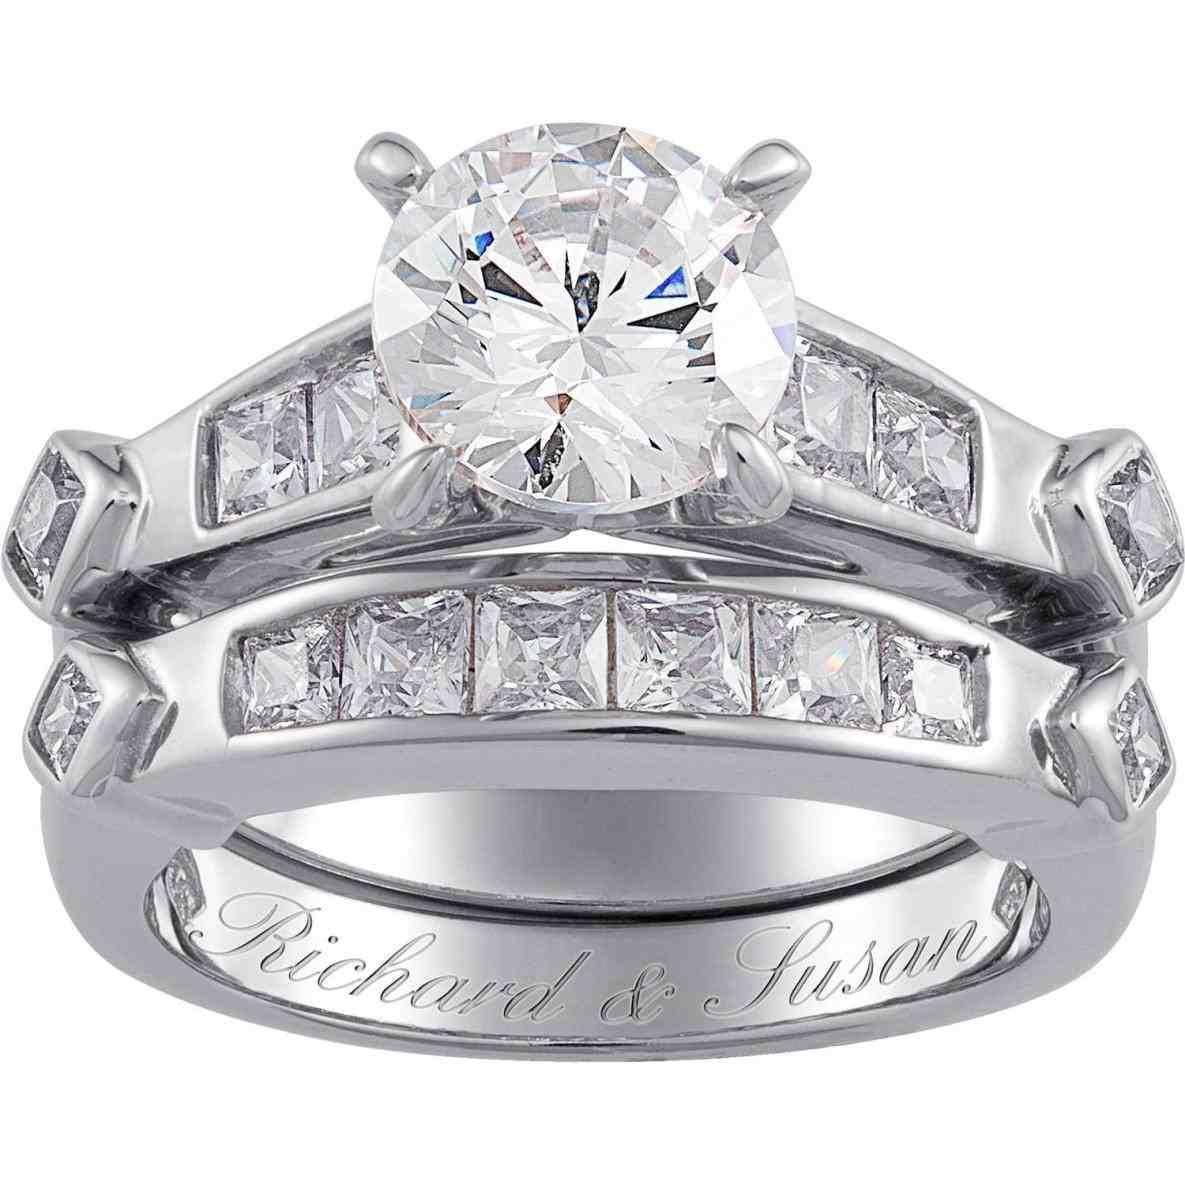 silicone wedding bands walmart Cz wedding ring sets